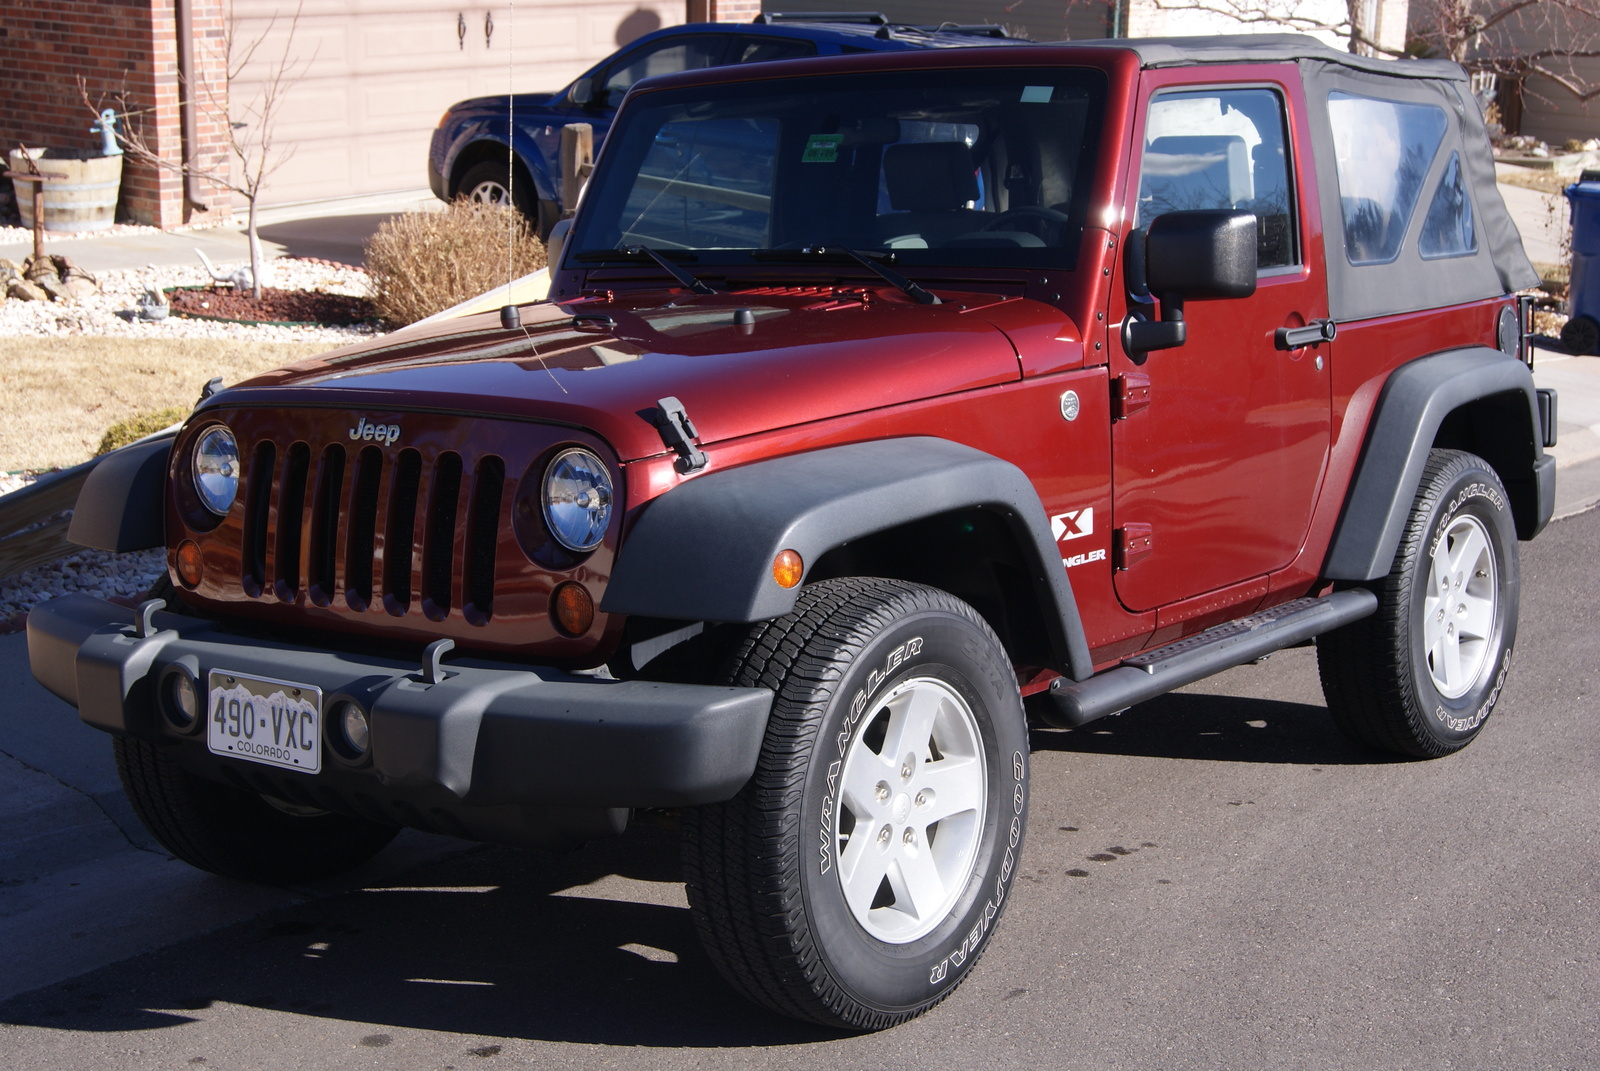 2008 Jeep Wrangler Pictures Cargurus